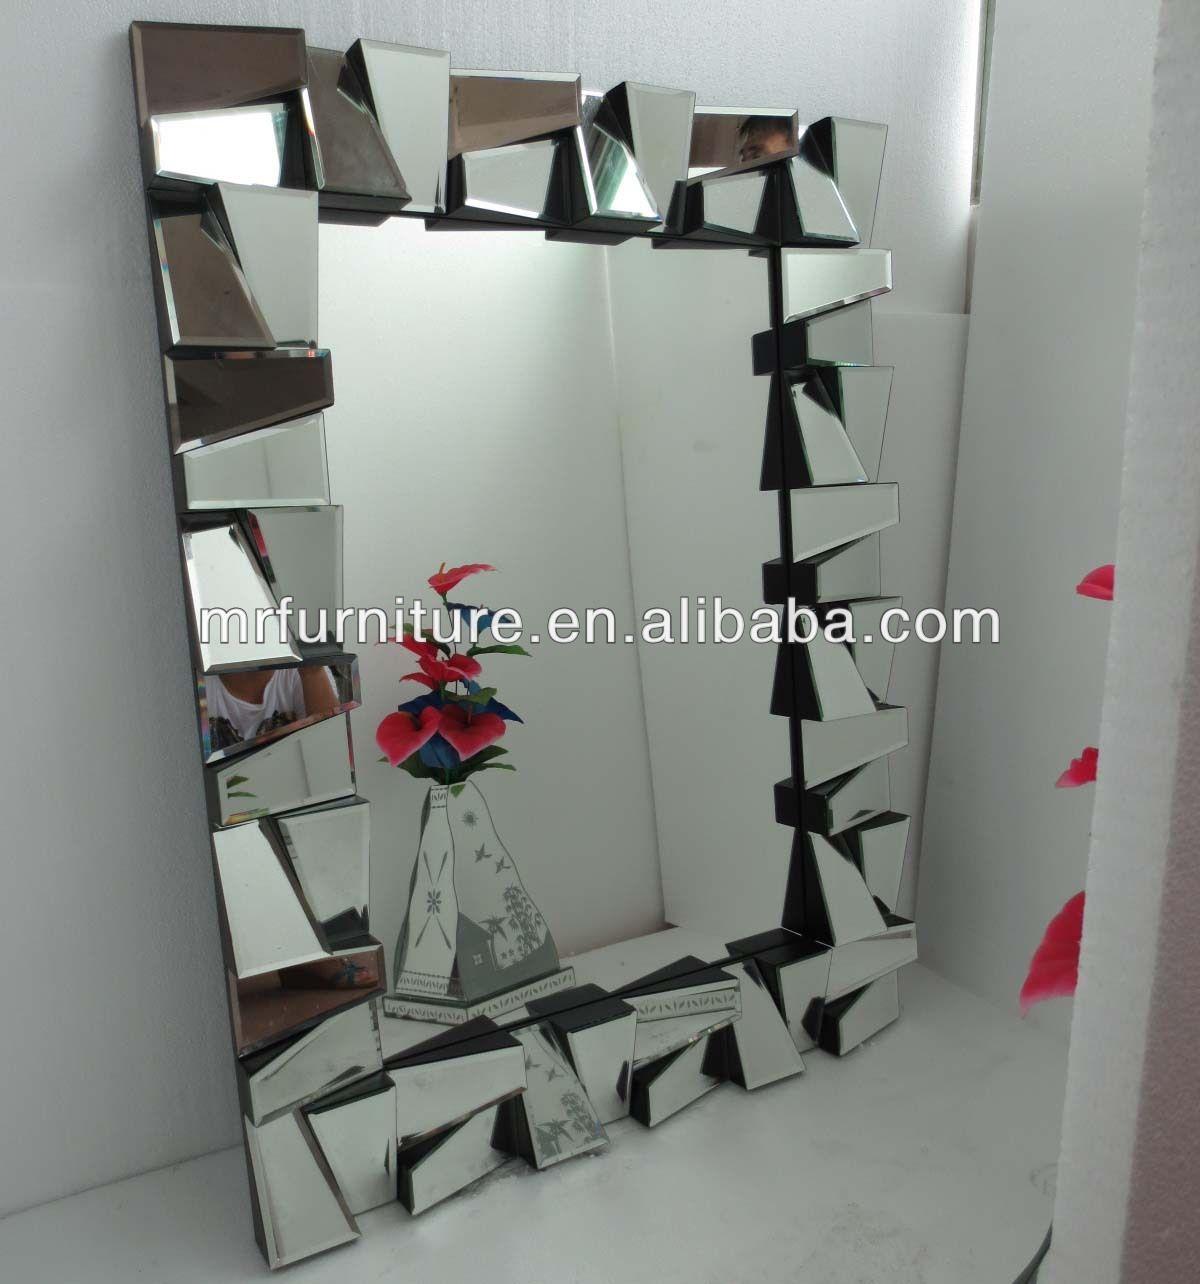 Multi Faceted Wall Mirror Httpdrrw Pinterest Mirror